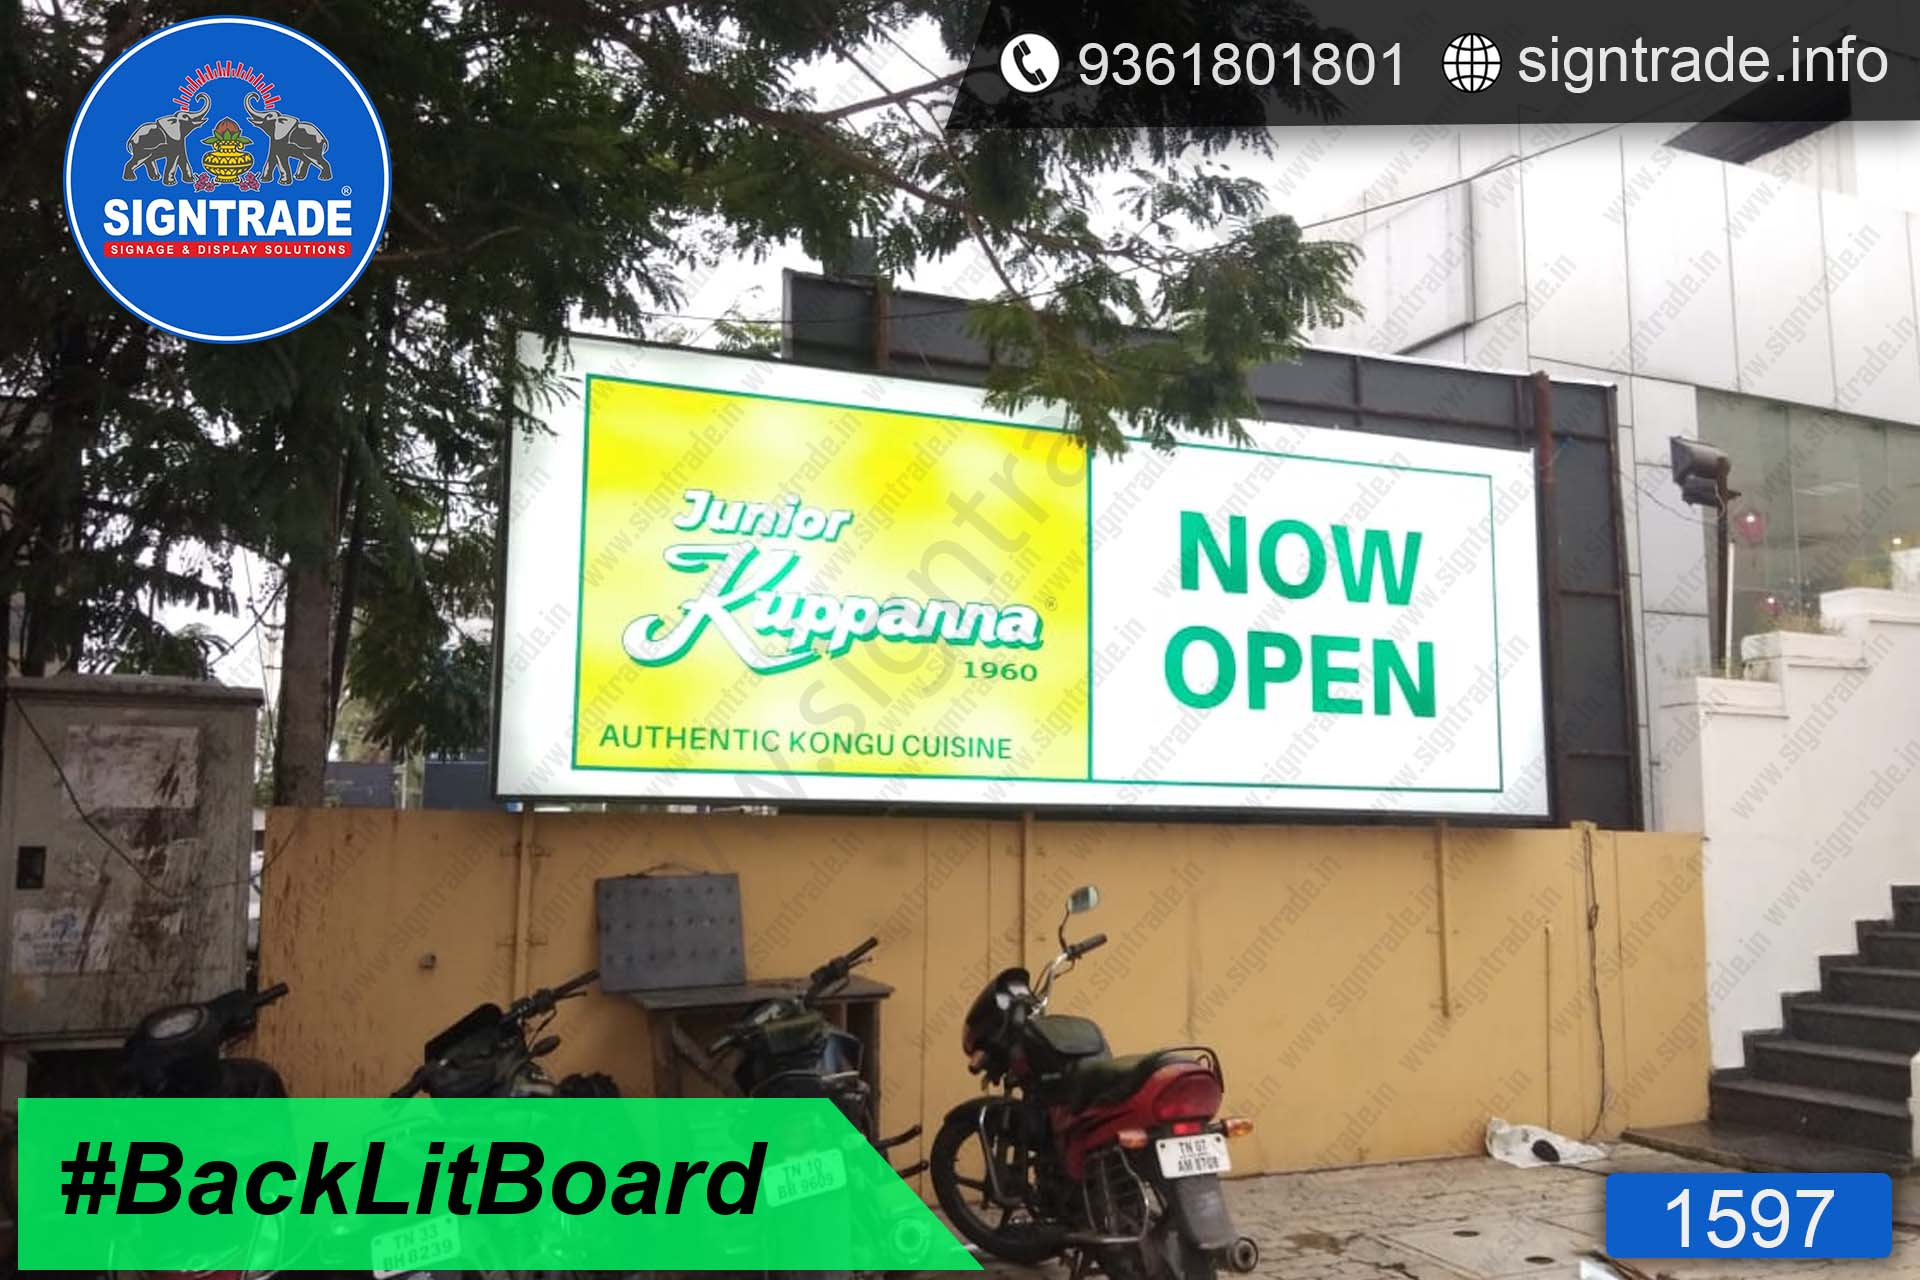 Hotel Junior Kuppanna, Chennai - SIGNTRADE - Digital Flex Printing Service - Backlit Flex Board Manufacturers in Chennai